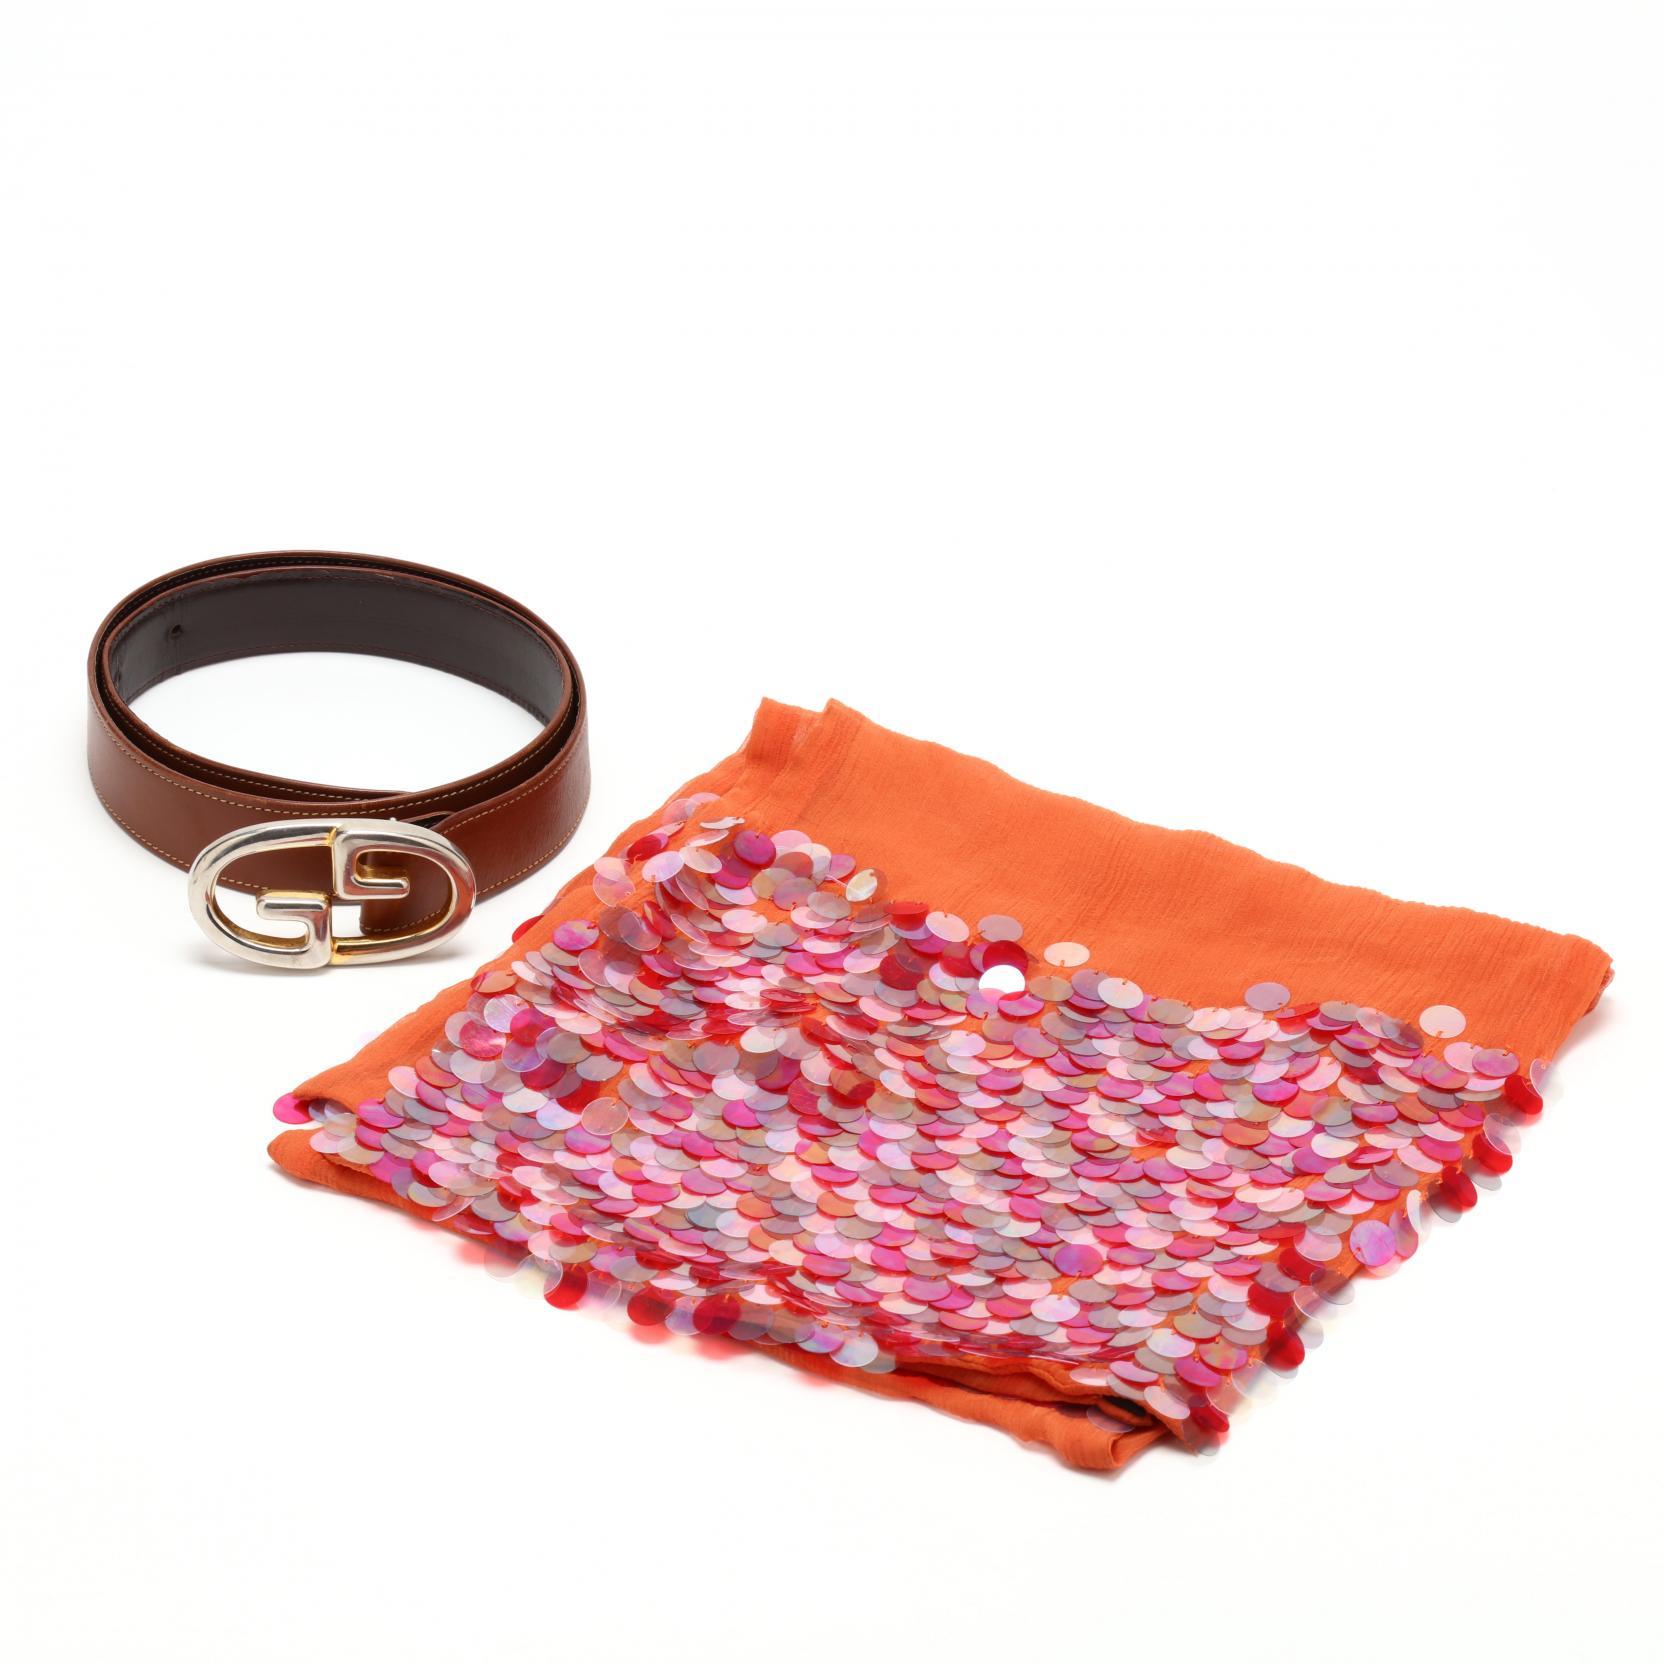 two-designer-fashion-items